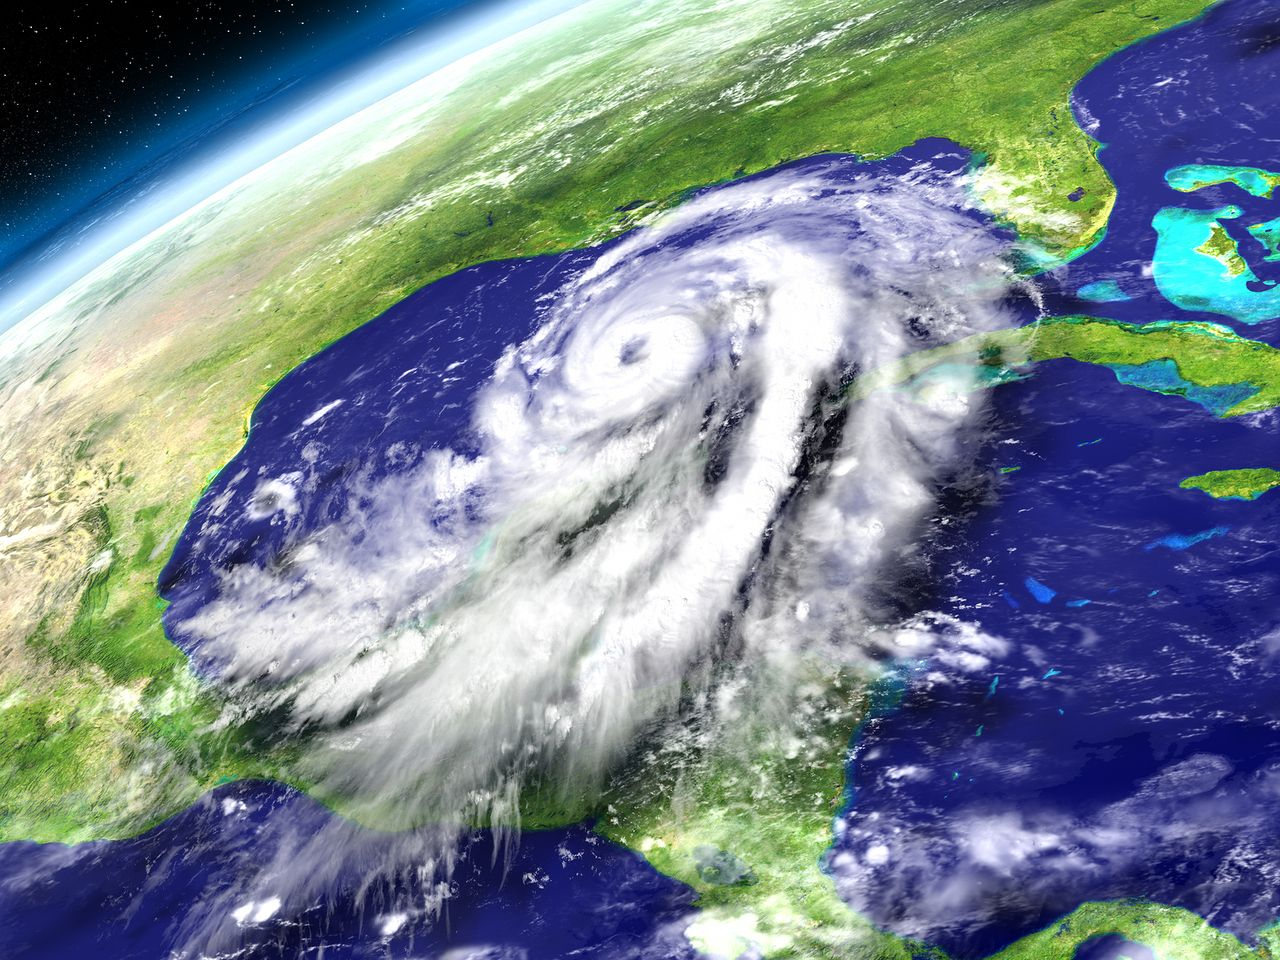 Stl News Breaking News Latest News St Louis News News Videos Florida Water Hurricane Season National Hurricane Center